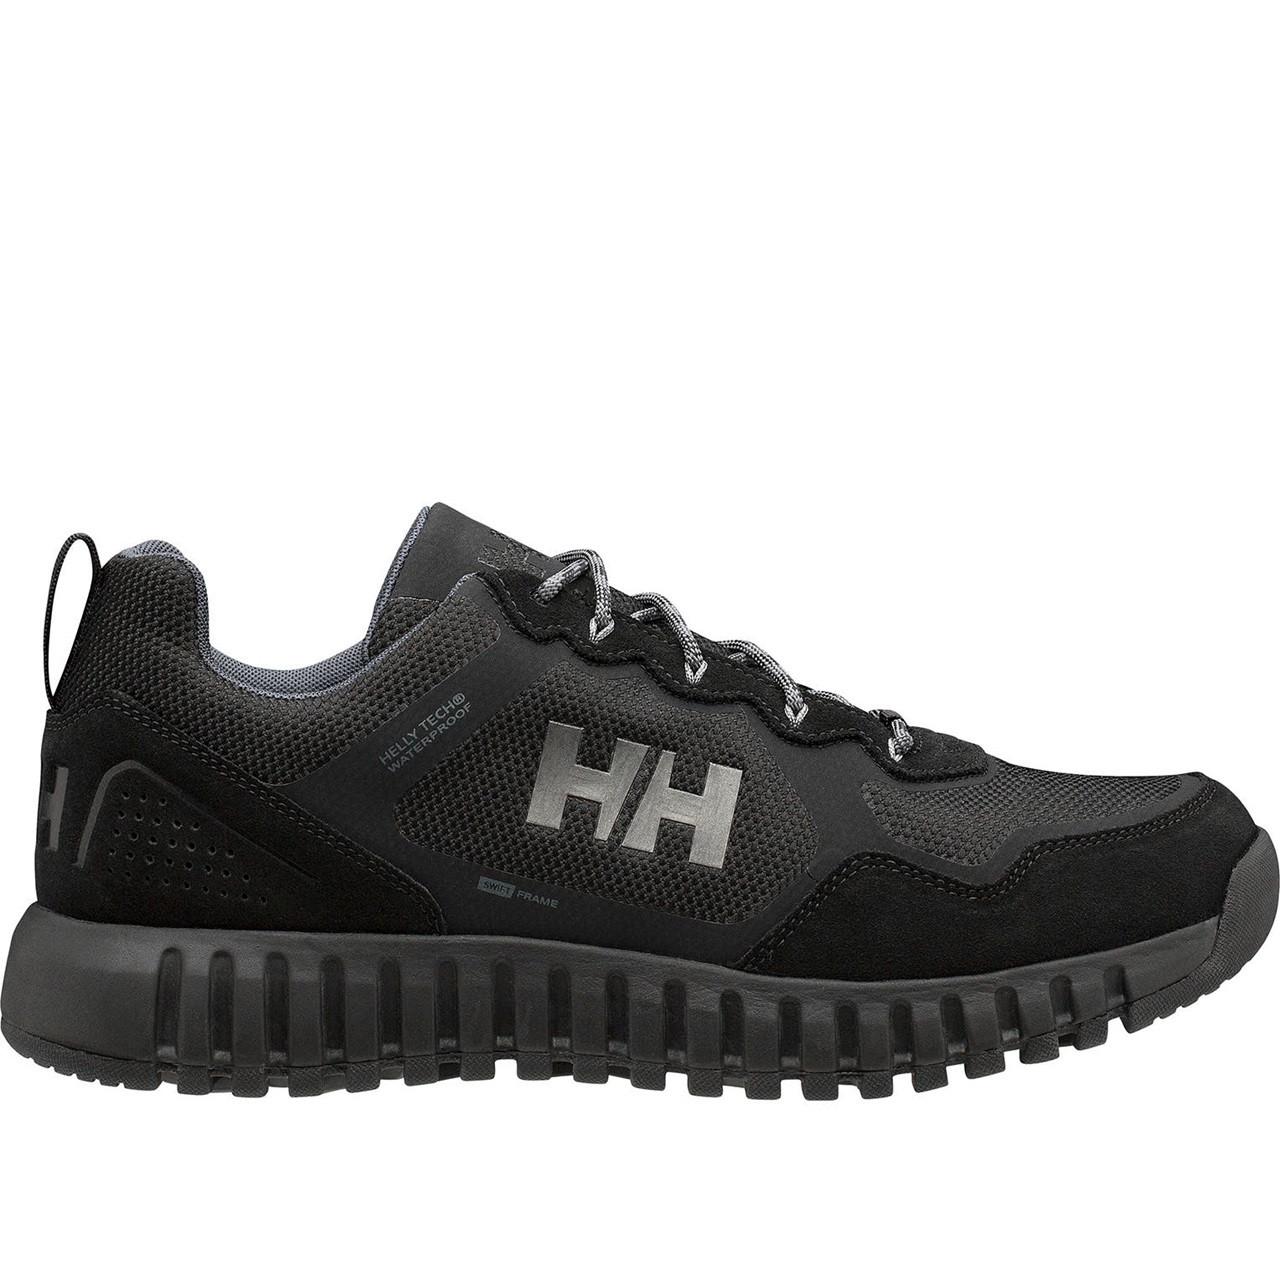 Мужские кроссовки  HELLY HANSEN MONASHEE ULLR LOW HT (11464 990)